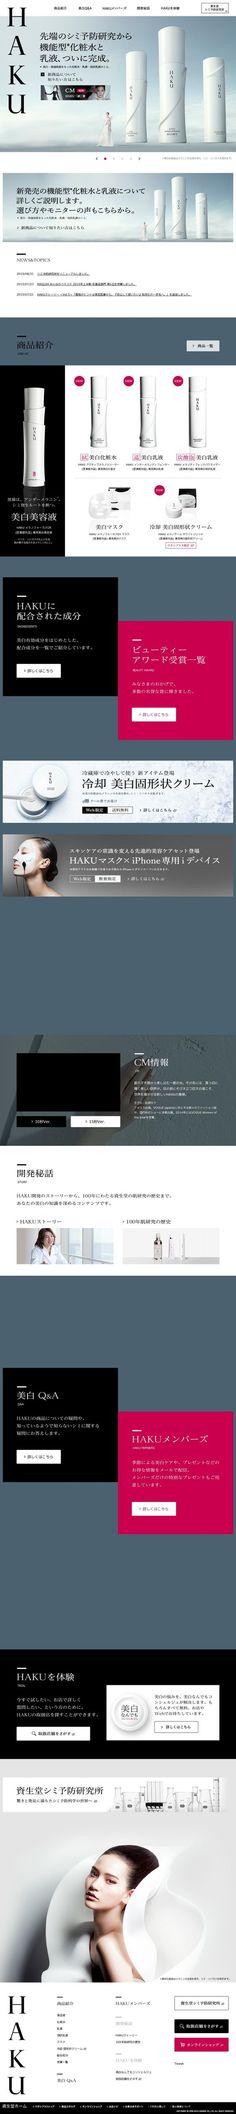 The website 'http://www.shiseido.co.jp/haku/index.html' courtesy of @Pinstamatic (http://pinstamatic.com):